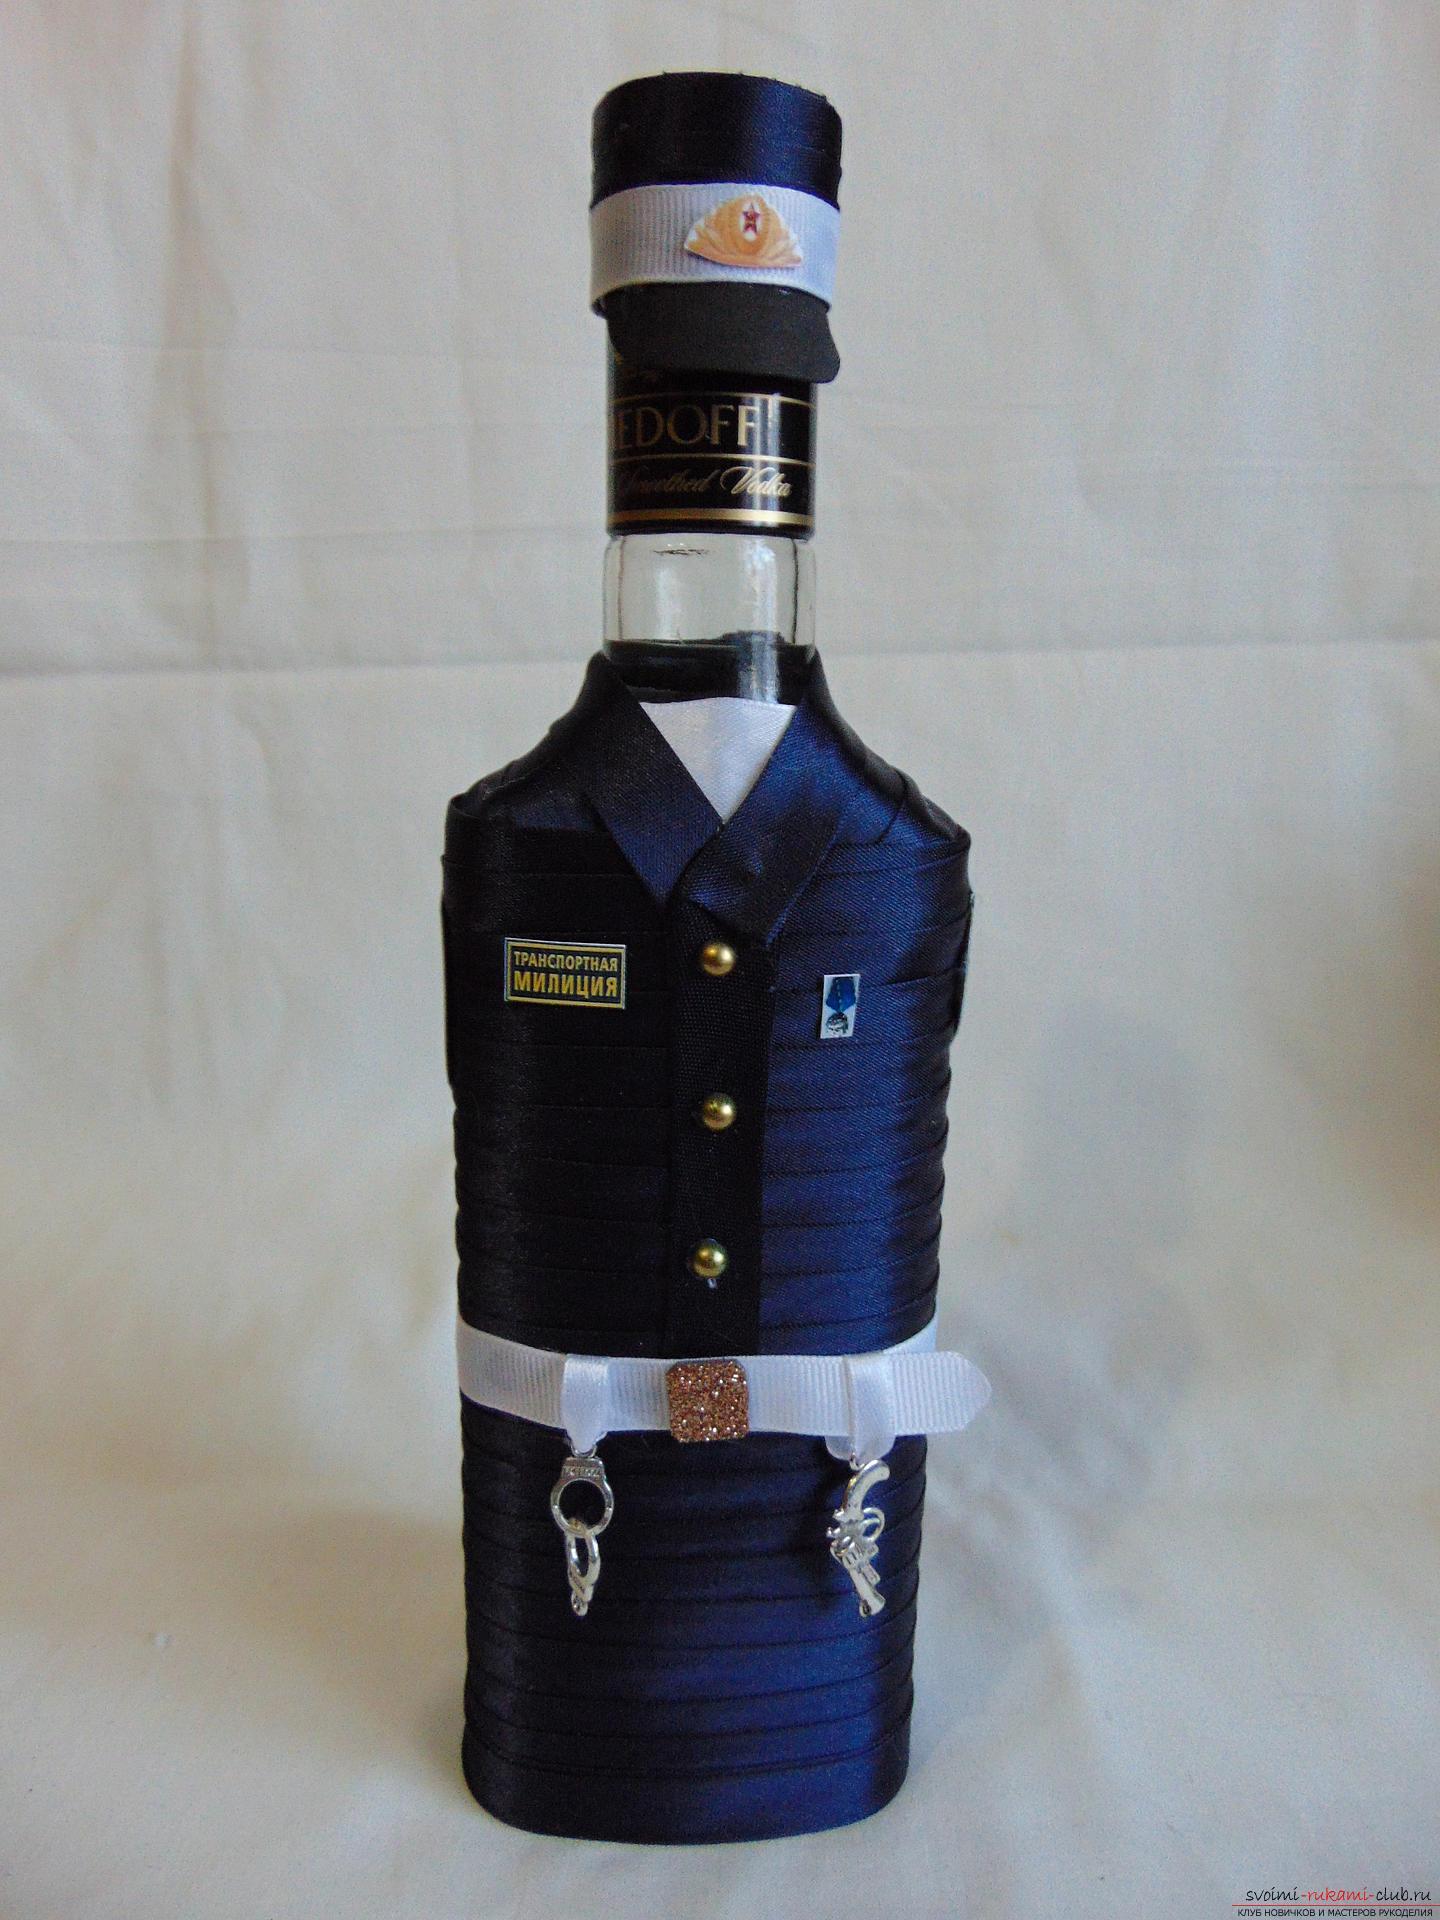 Как украсить бутылку на 23 февраля мастер